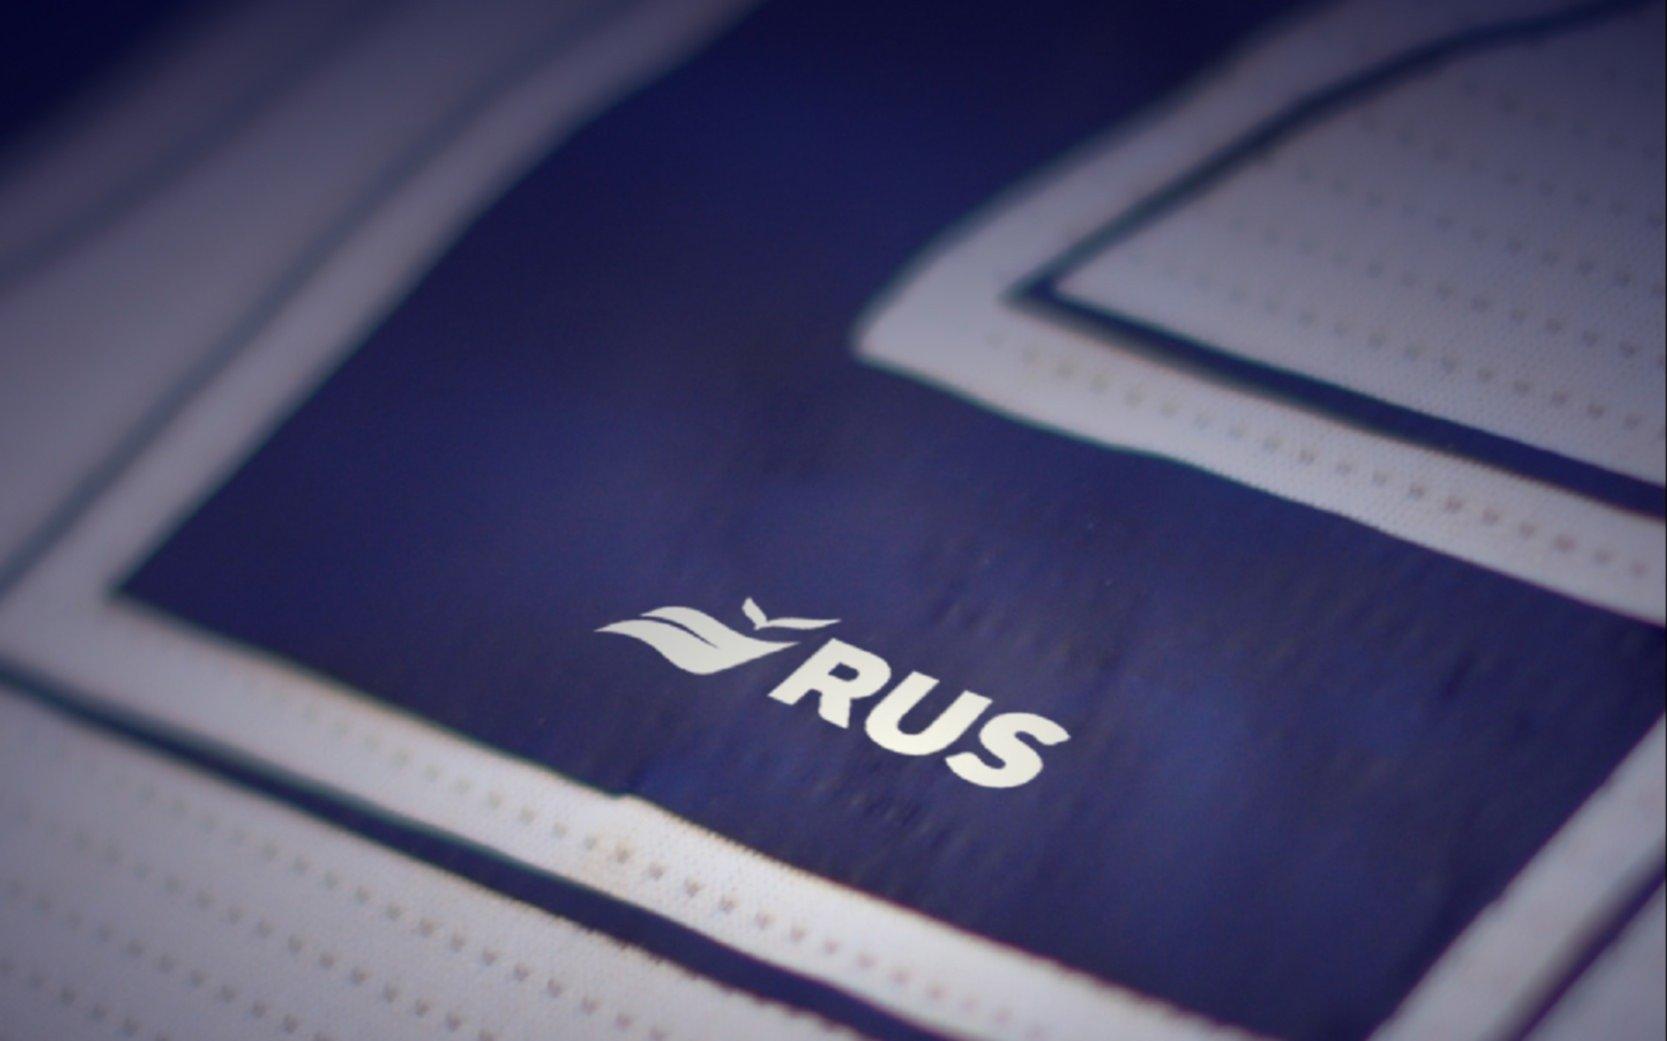 Gimnasia presentó un nuevo sponsor para su camiseta